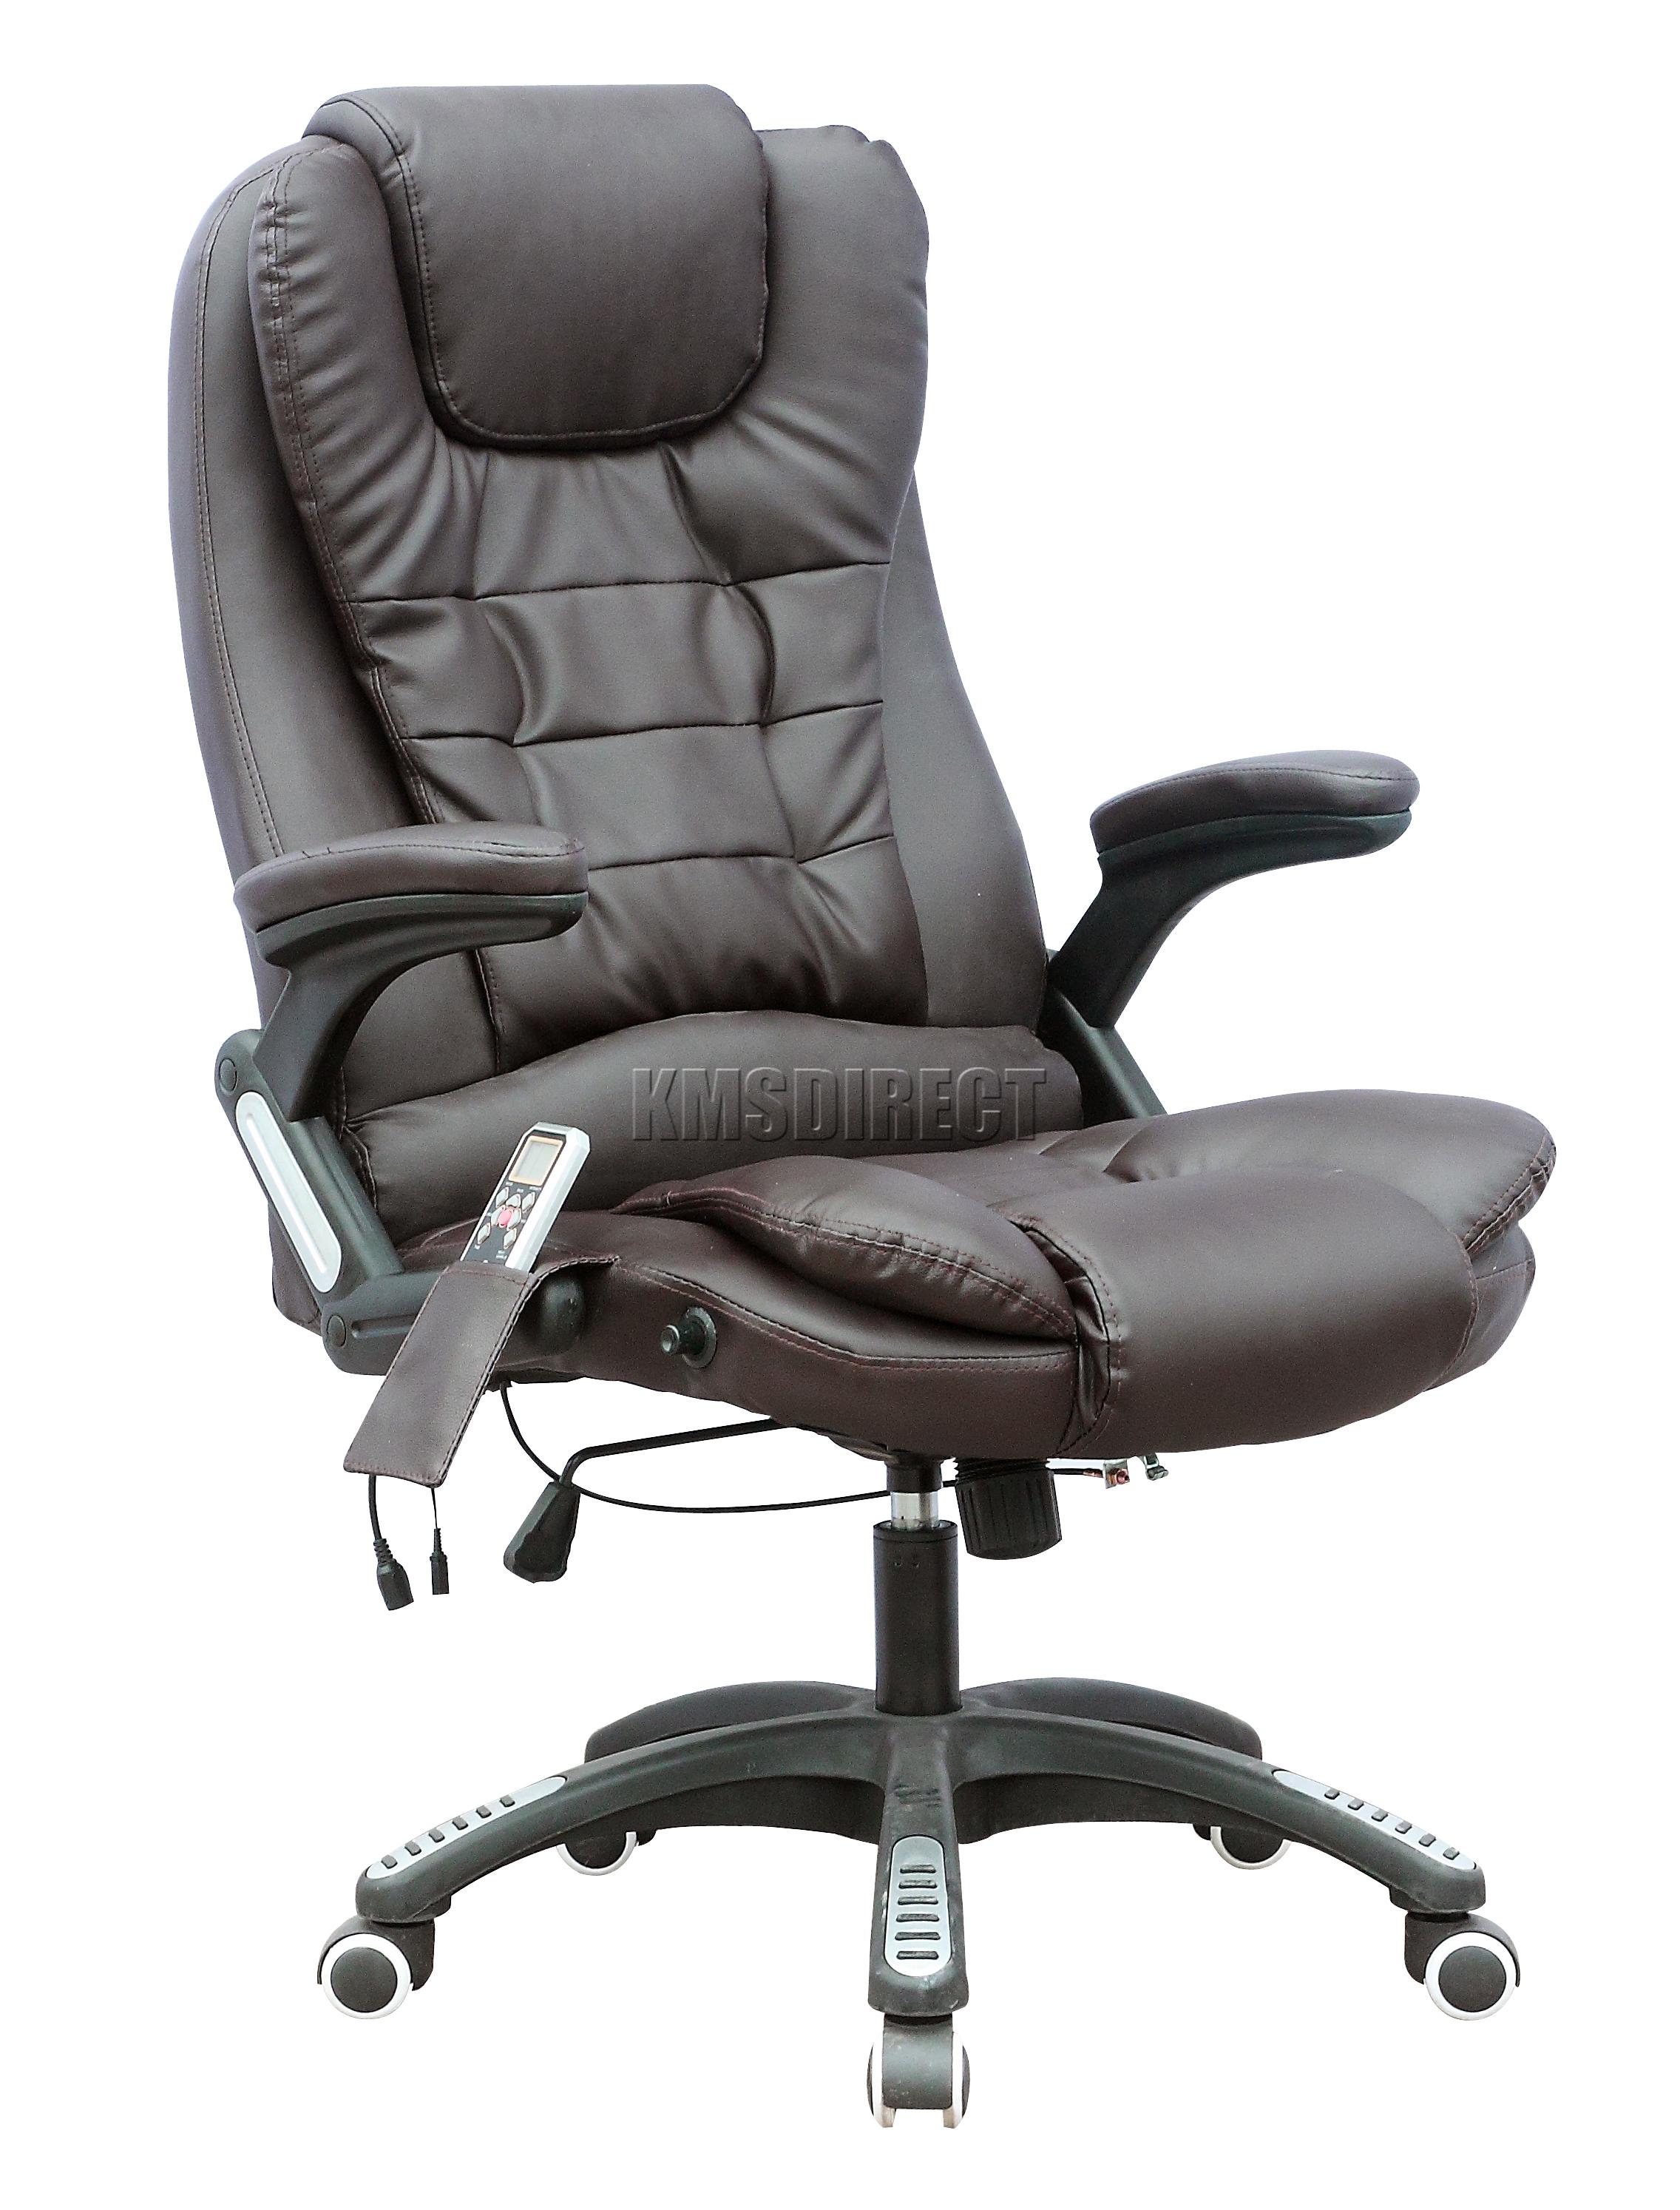 FoxHunter 6 Point Massage Office Computer Chair Luxury